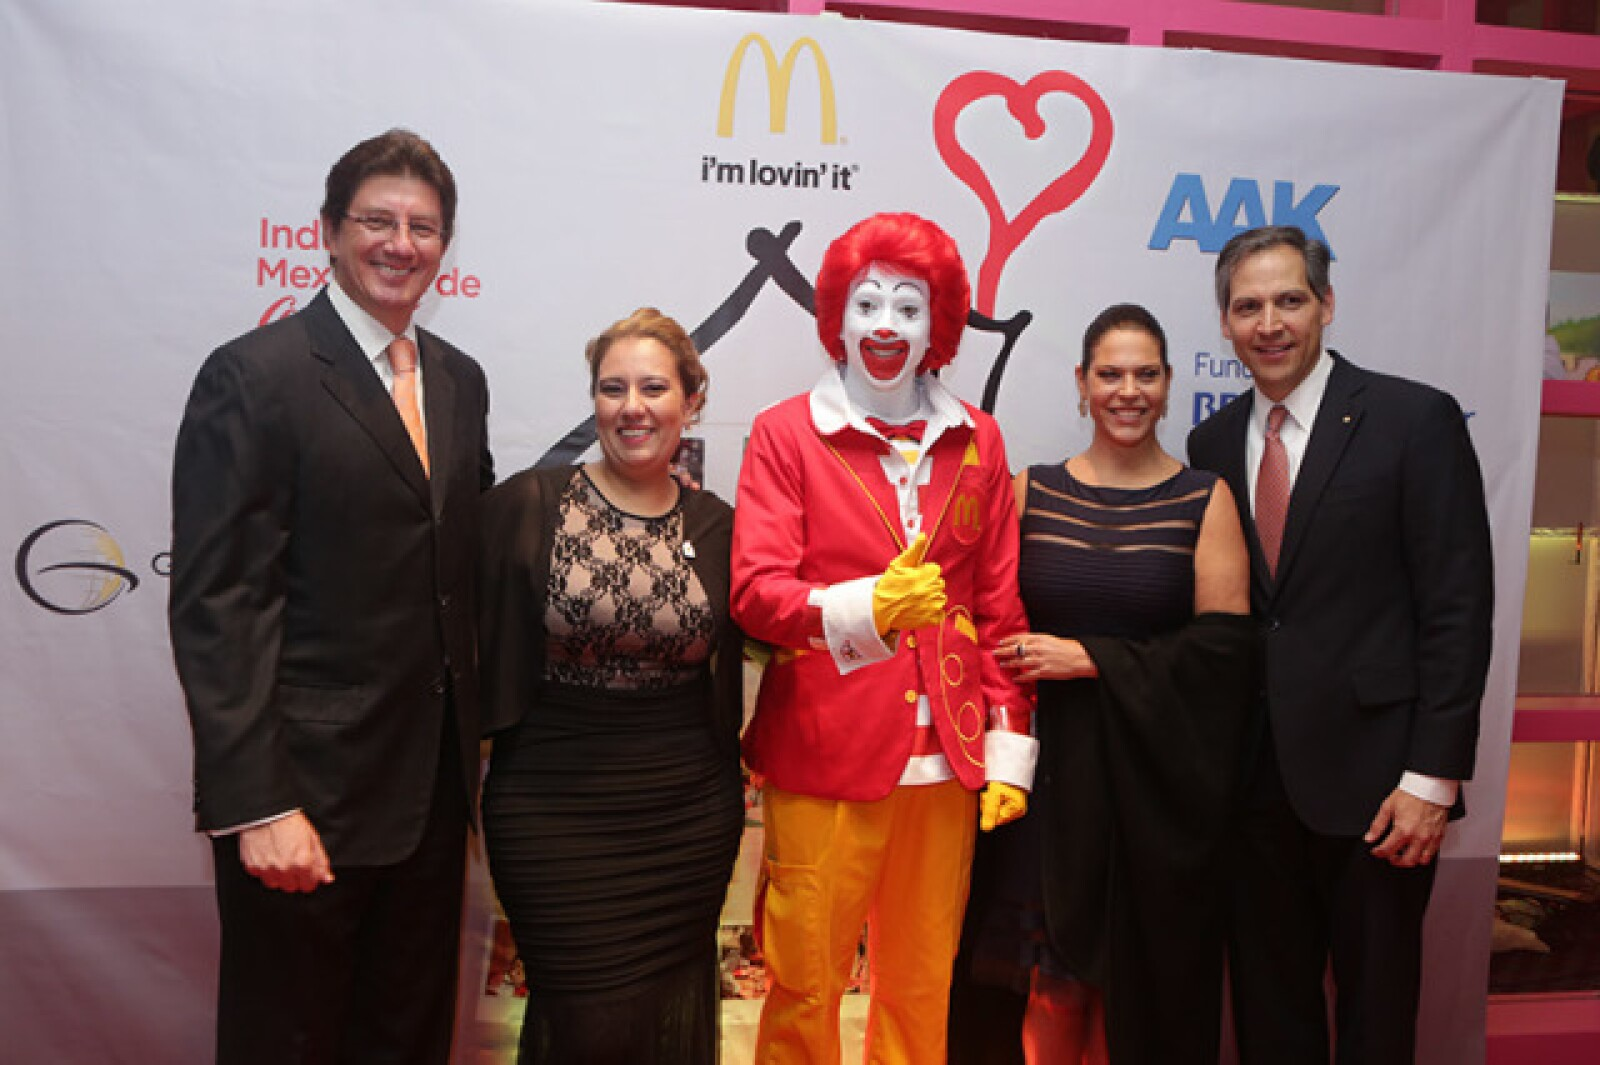 Félix Ramírez Montiel,Mayra Fritsche,Ronald McDonald,Irene Sorokin y Paul Davis